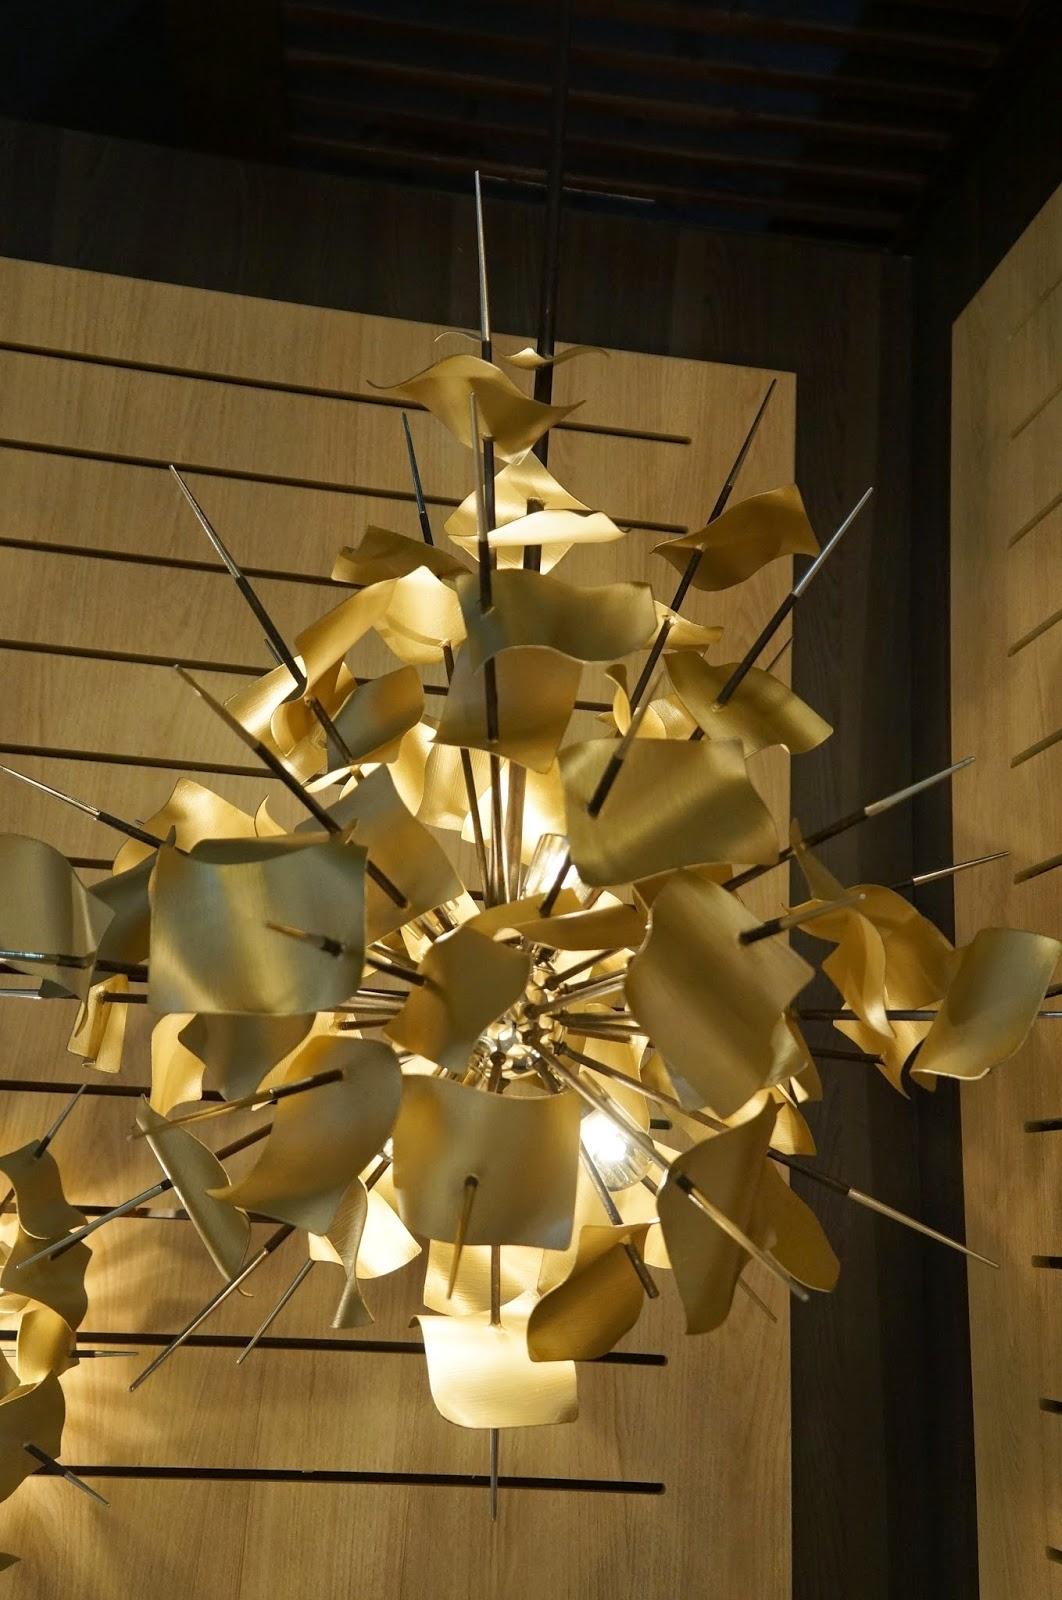 pendente Poetry de ferro forjado à mão - Corbett Lighting - Expolux 2014